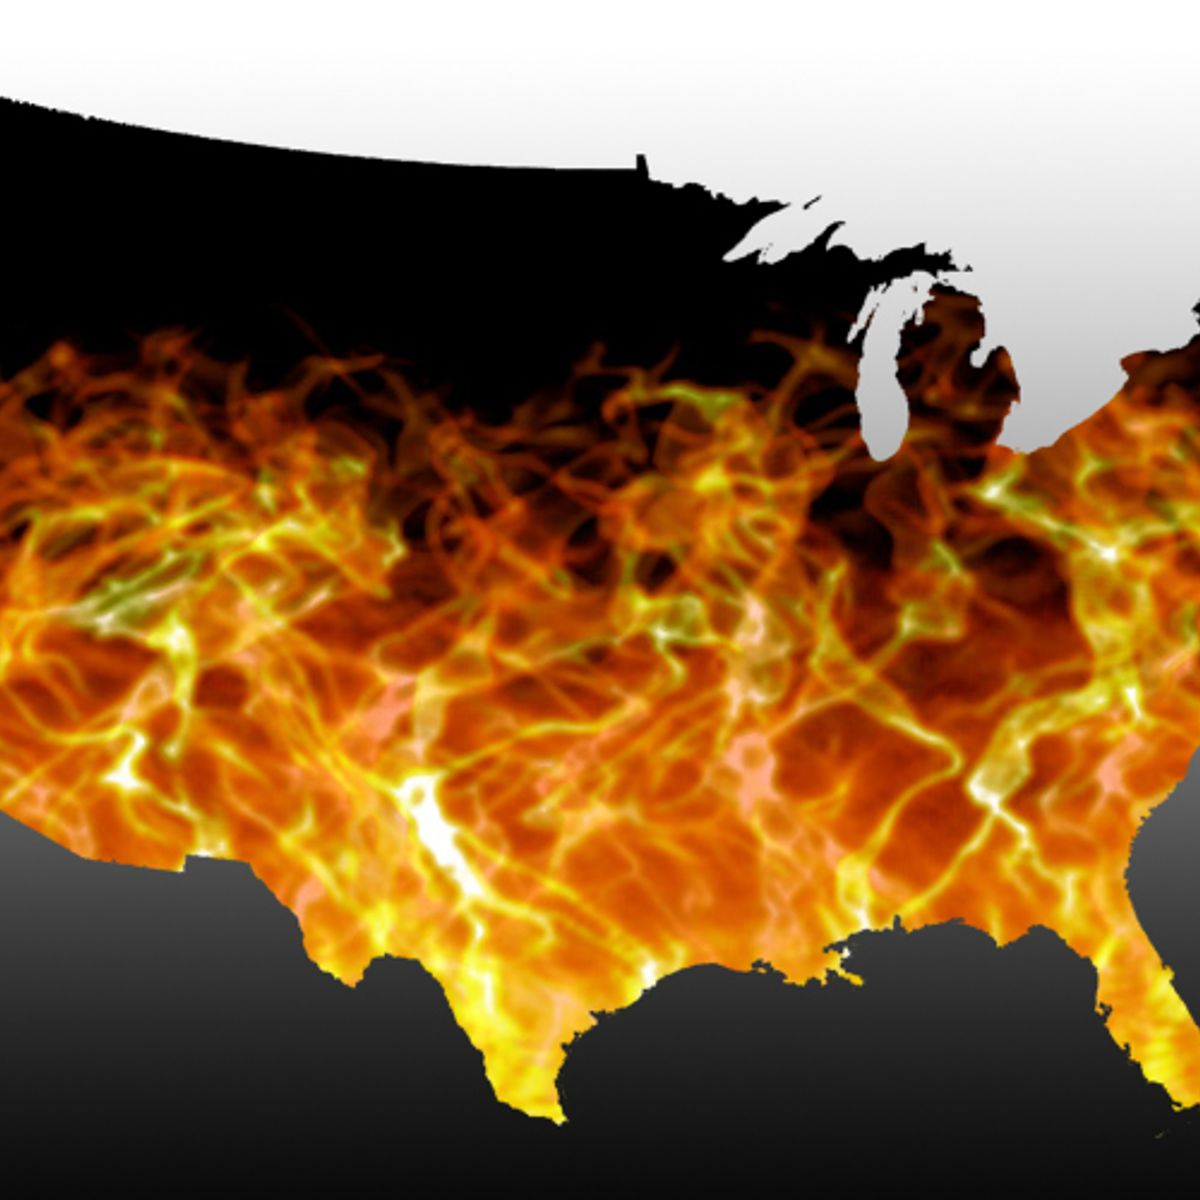 اجتجاجات امريكا الان -- متابعه   How_america_will_collapse_by_2025